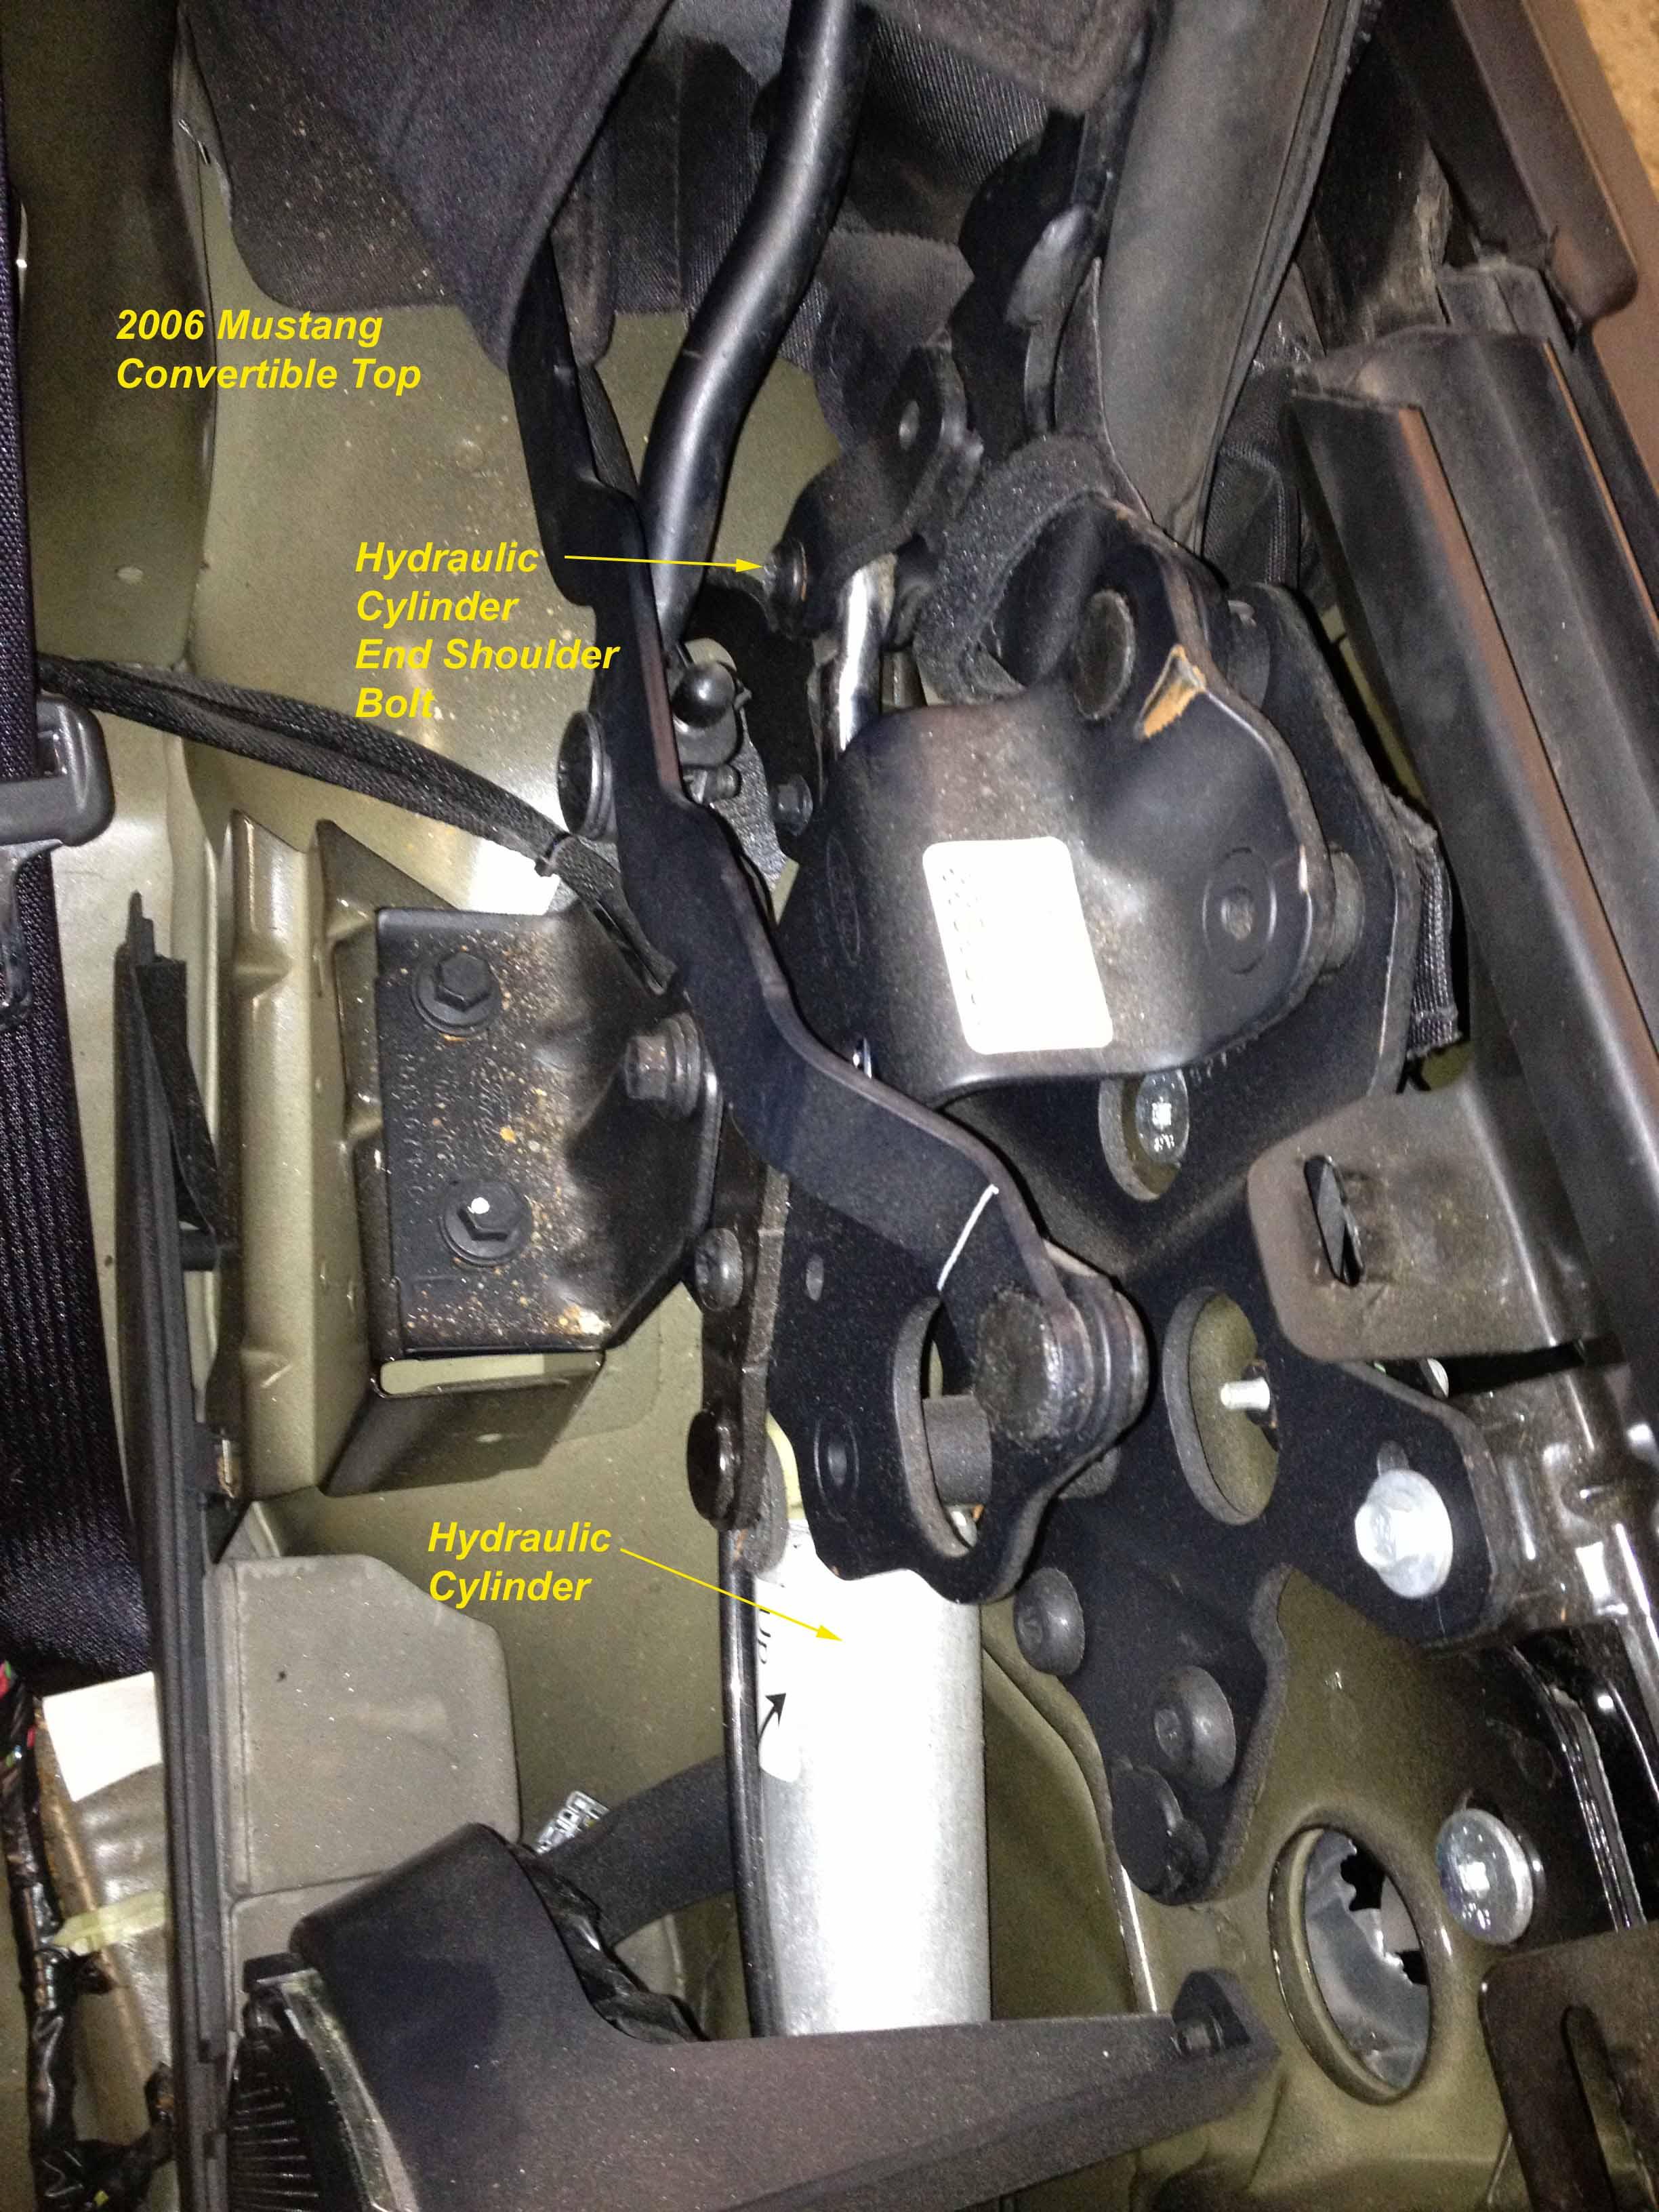 Click image for larger version  Name:Hydraulic Cylinder Shoulder Bolt.jpg Views:308 Size:475.4 KB ID:79498